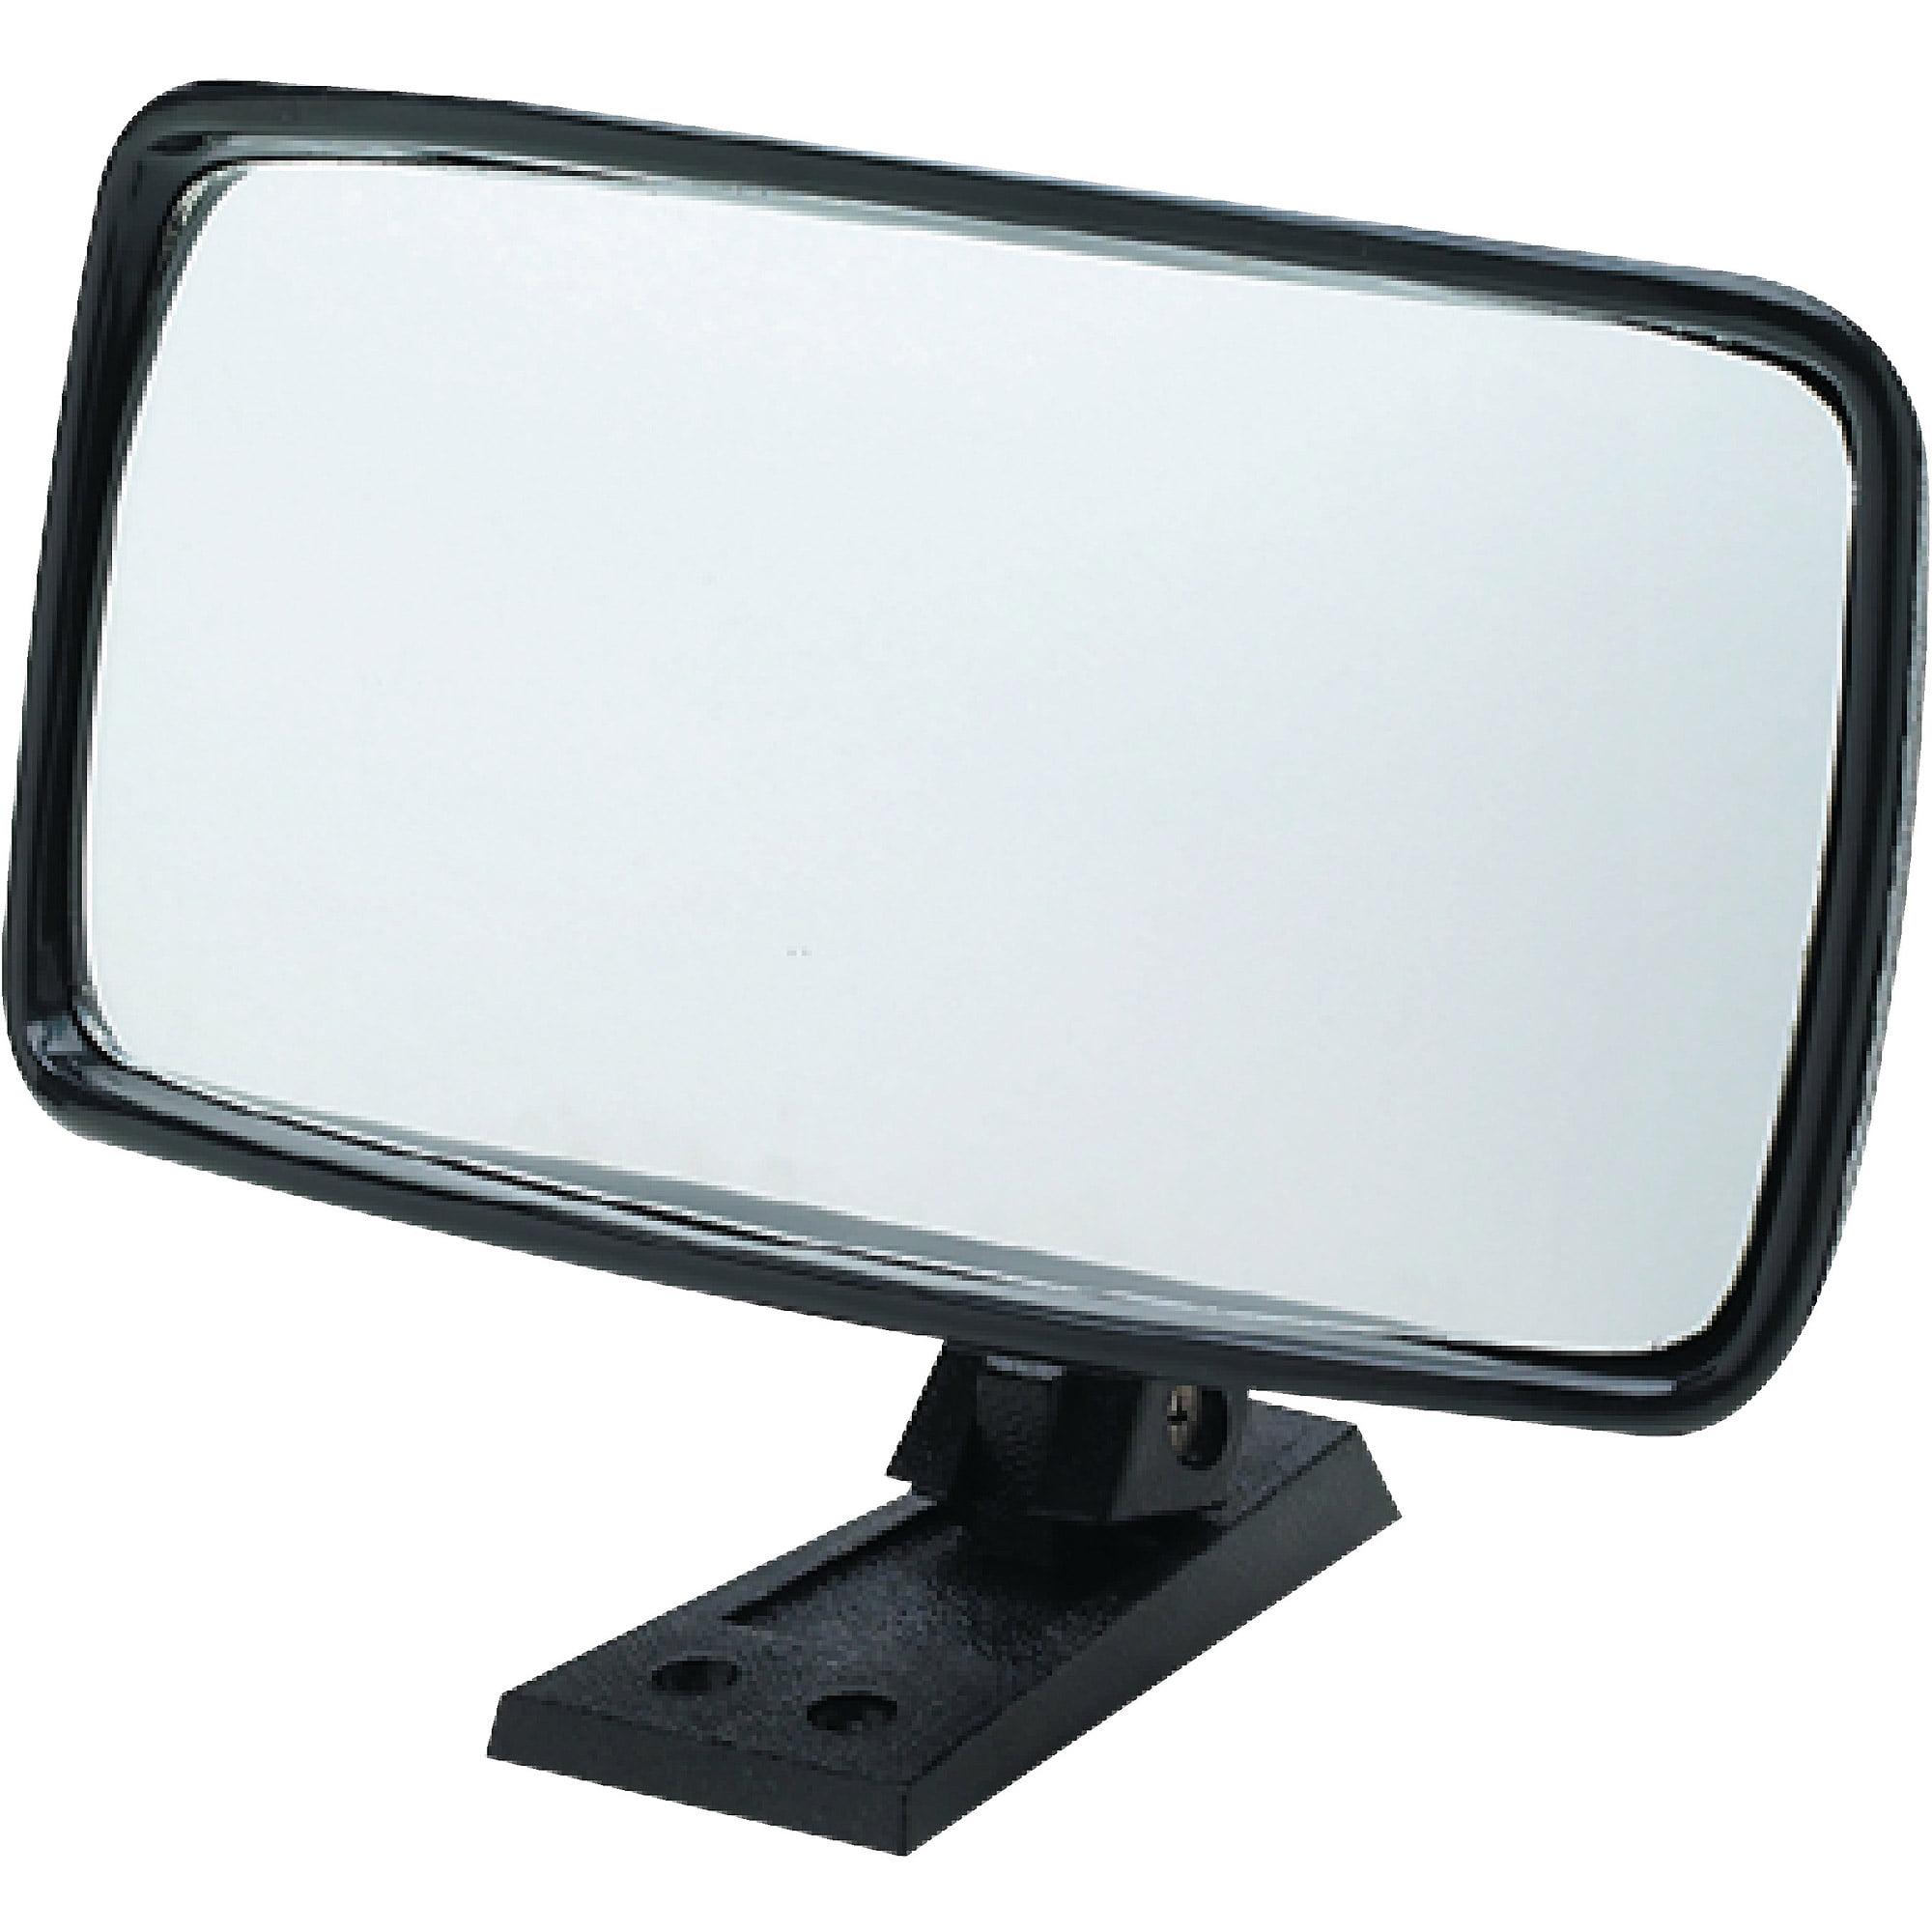 Seachoice Universal Boat Mirror by Seachoice